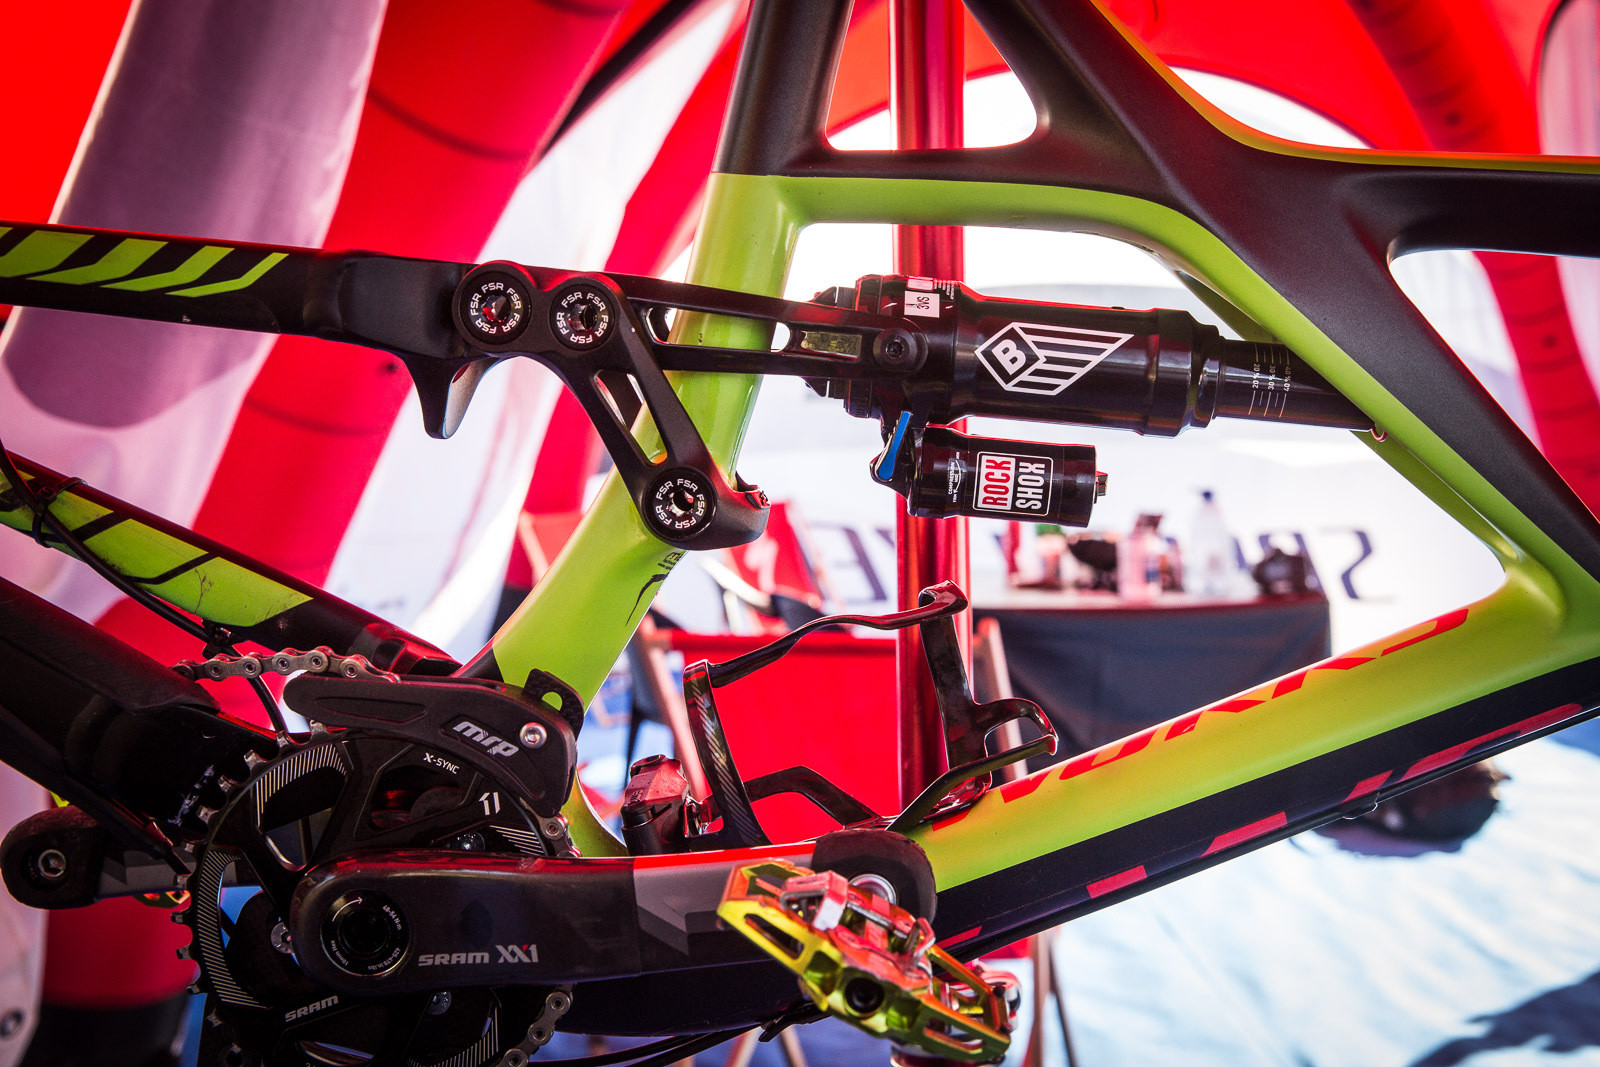 PIT BITS - Jared Graves' BlackBox Rear Shock  - PIT BITS - Enduro World Series, Wicklow, Ireland - Mountain Biking Pictures - Vital MTB